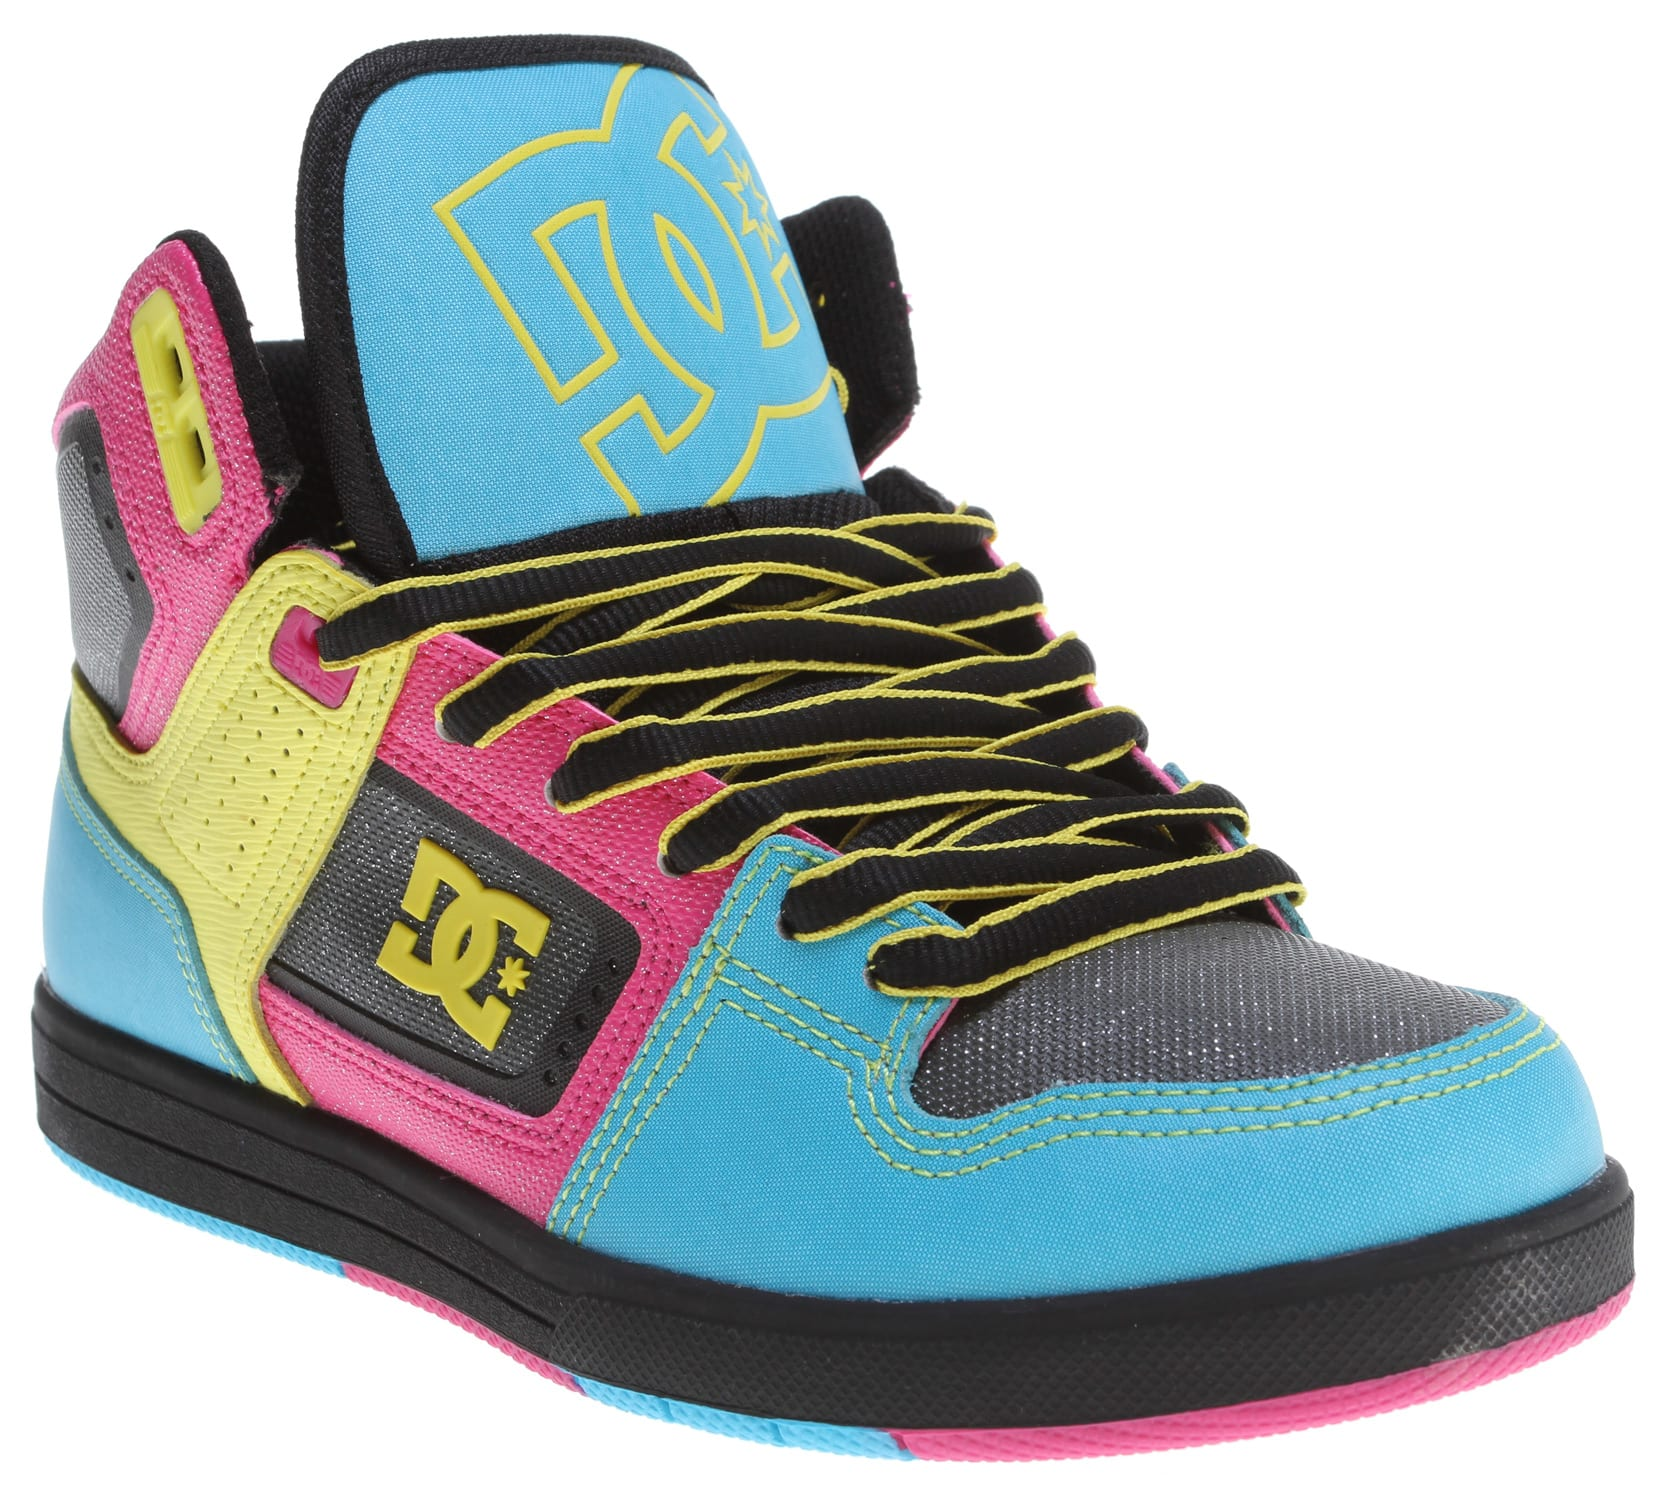 Dc Destroyer Hi Skate Shoes Thumbnail 2